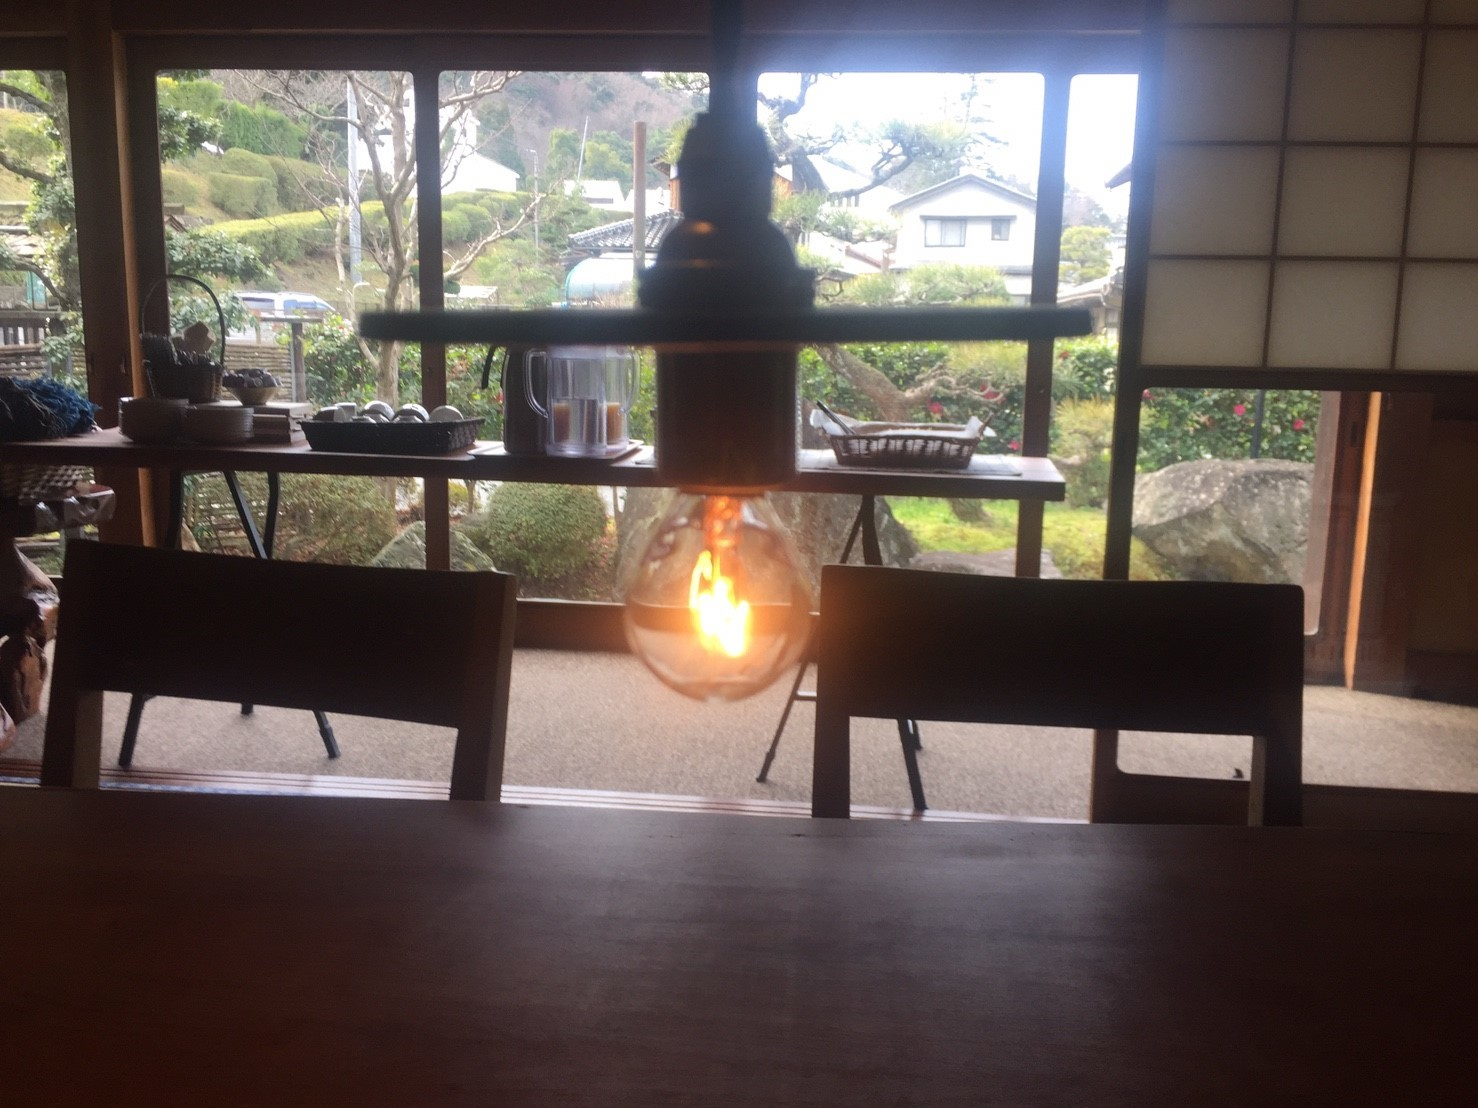 kitchin & cafe 葵屋_e0115904_04425542.jpg